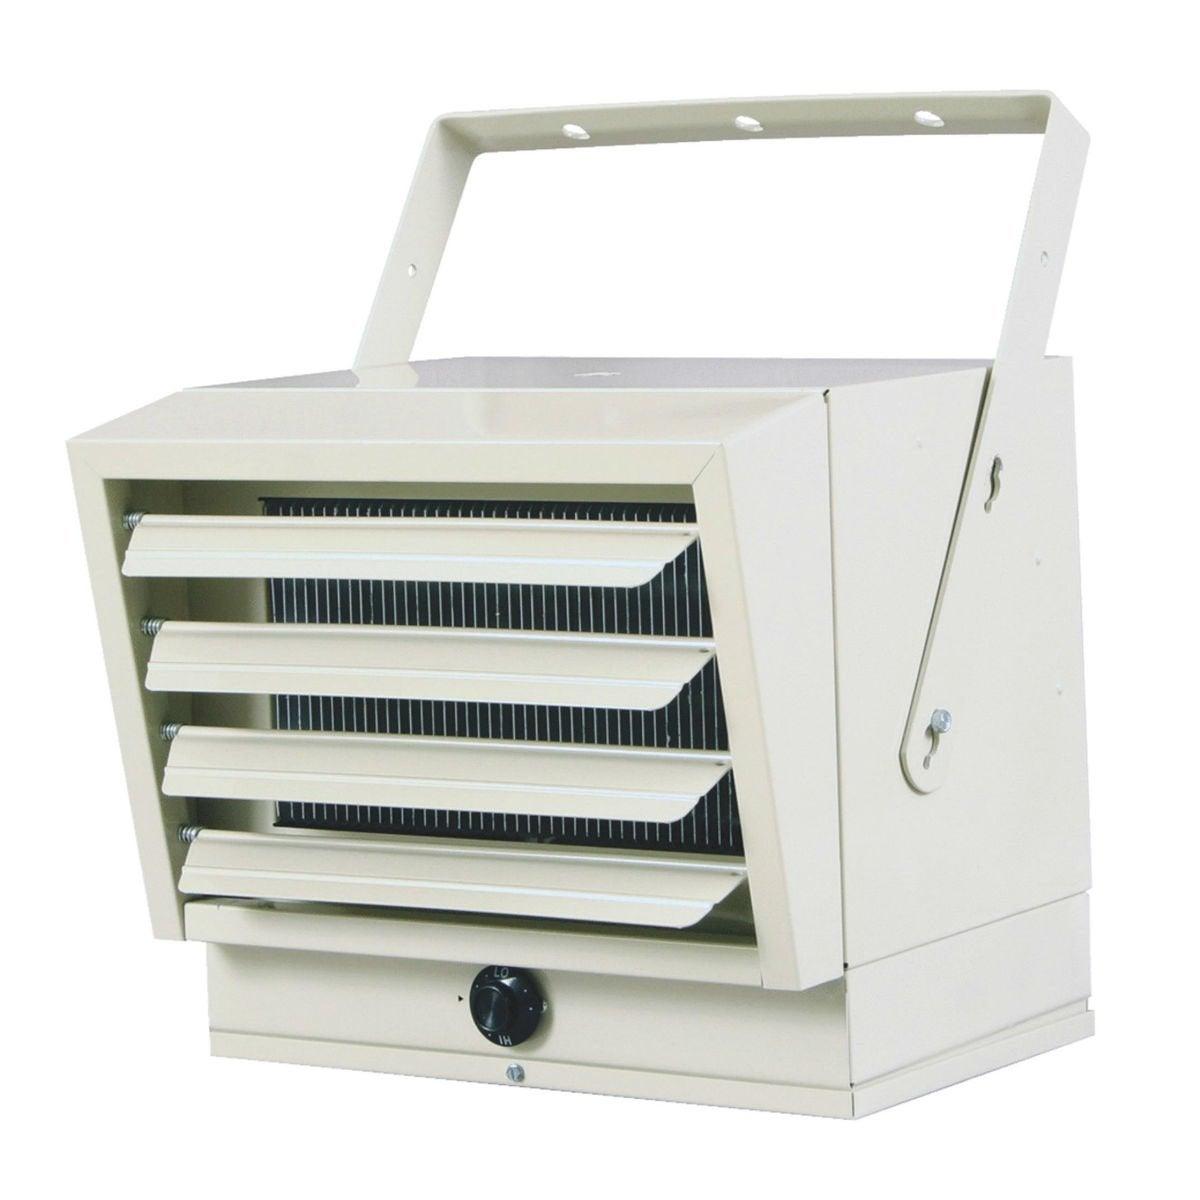 Best Garage Heater Options: Farenheat 5,000-Watt Electric Heater